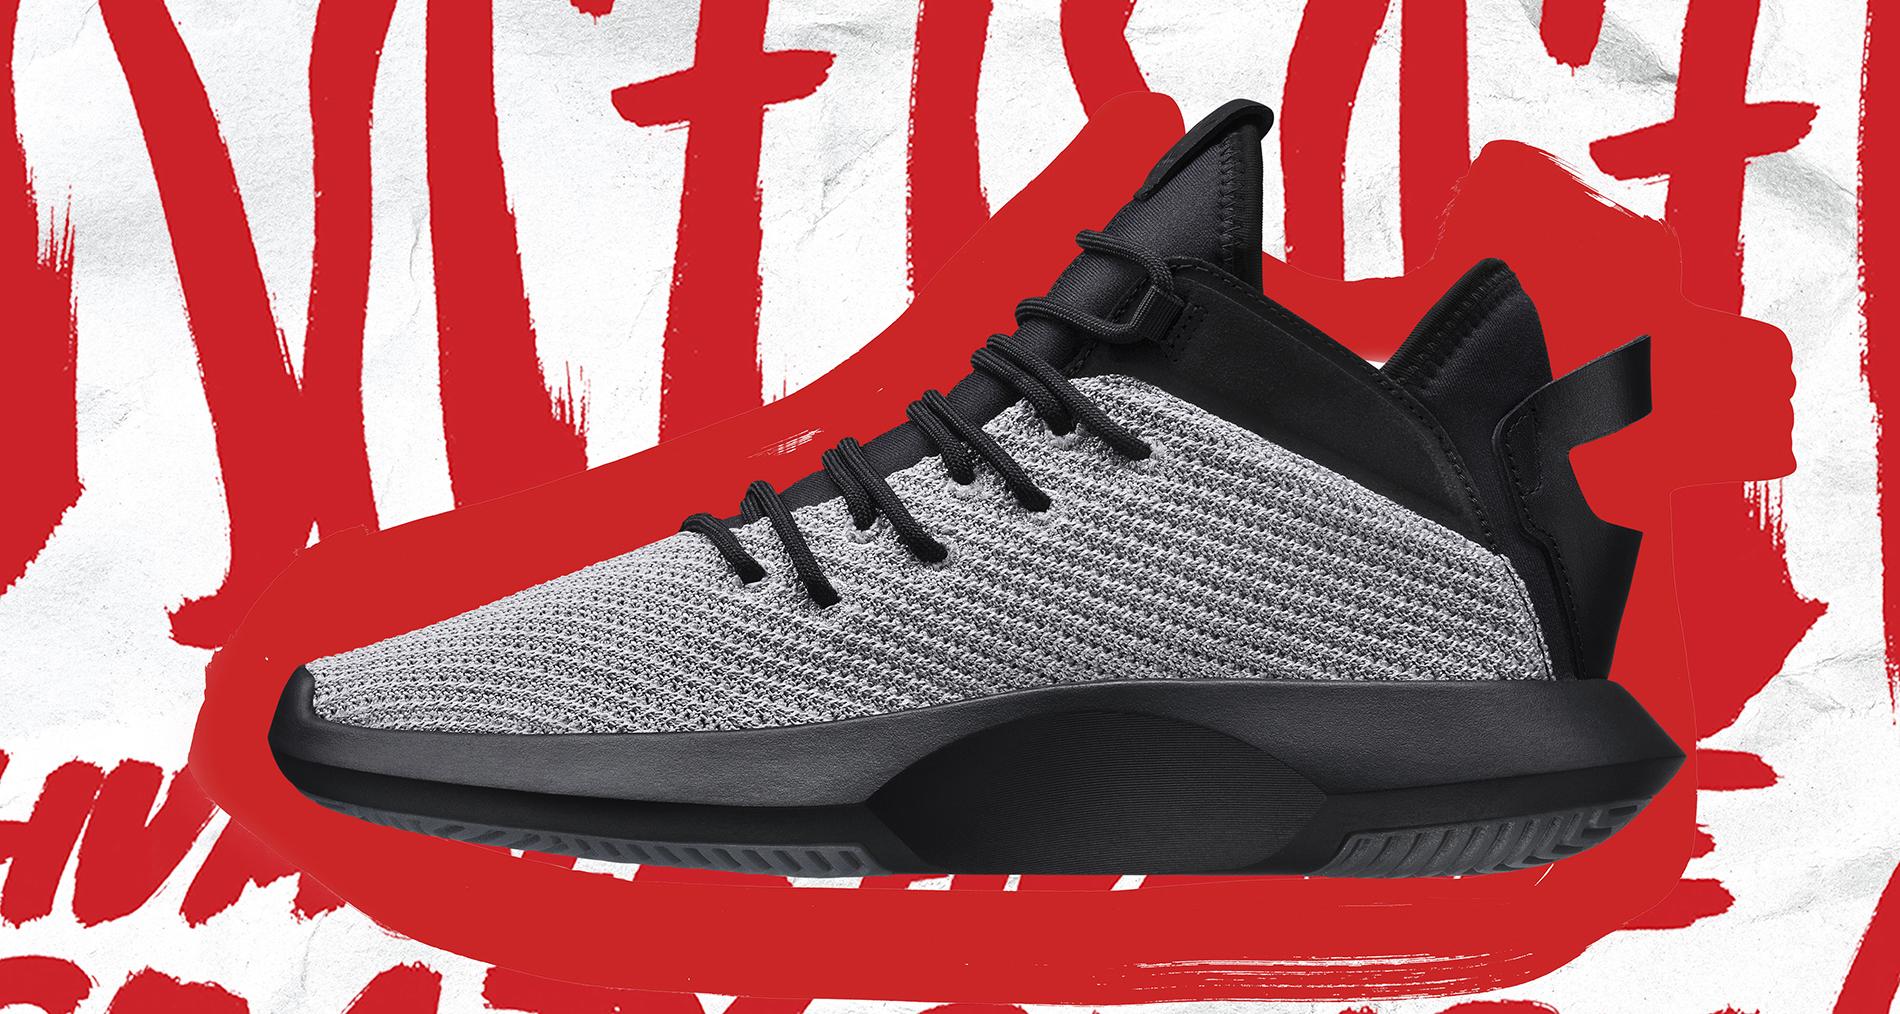 Adidas NMD R1 tripel black & talc BSTN review deutsch